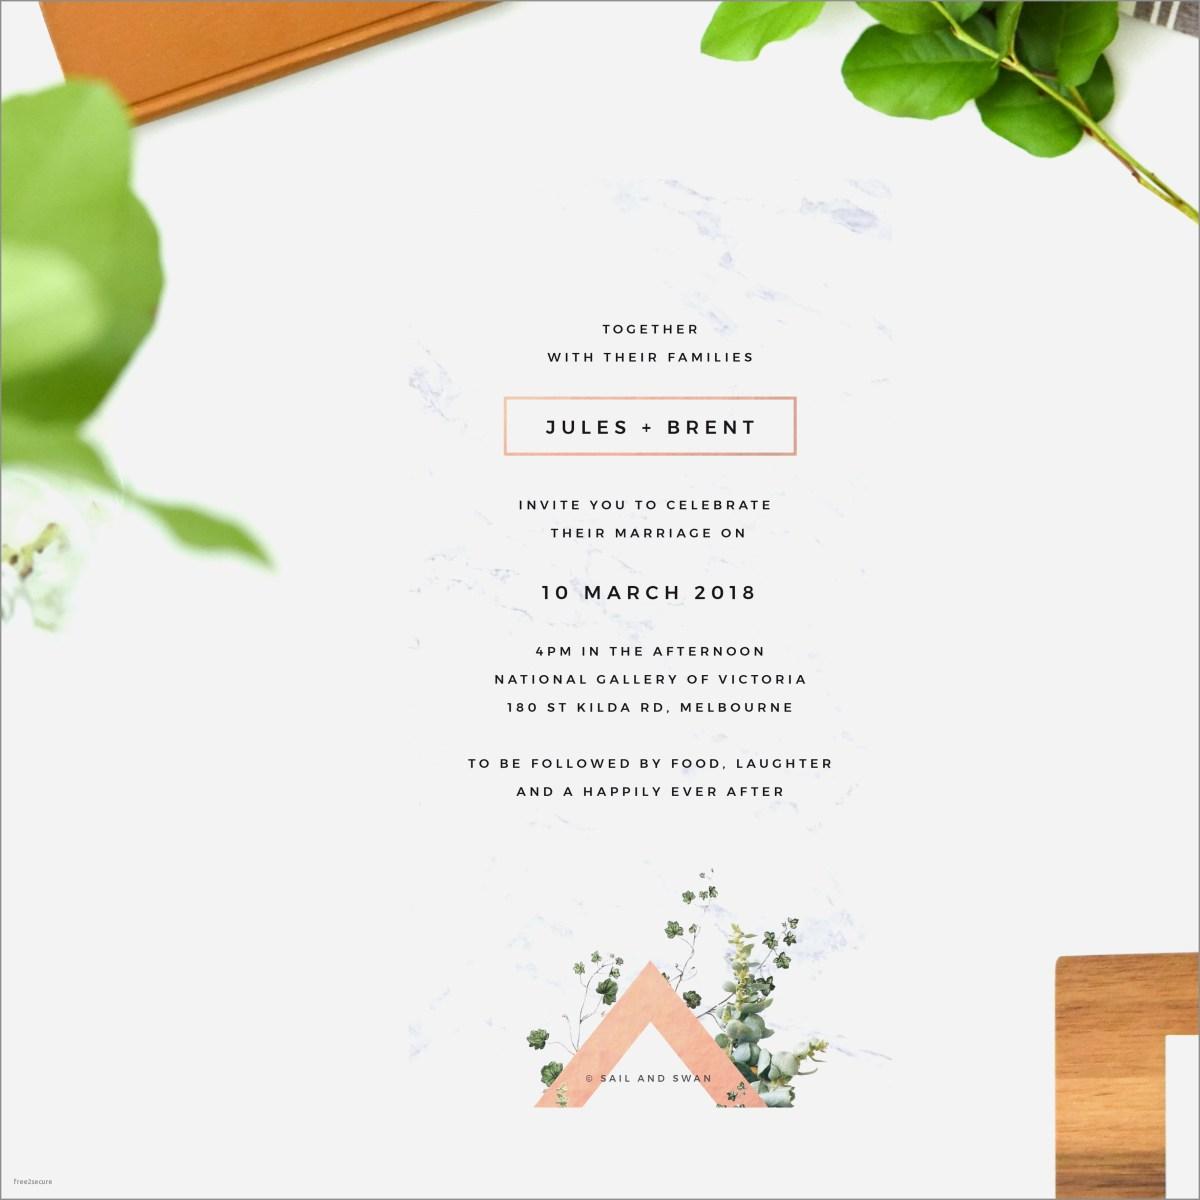 Vietnamese Wedding Invitations Wedding Invitation Wording In Vietnamese New Vietnamese Wedding